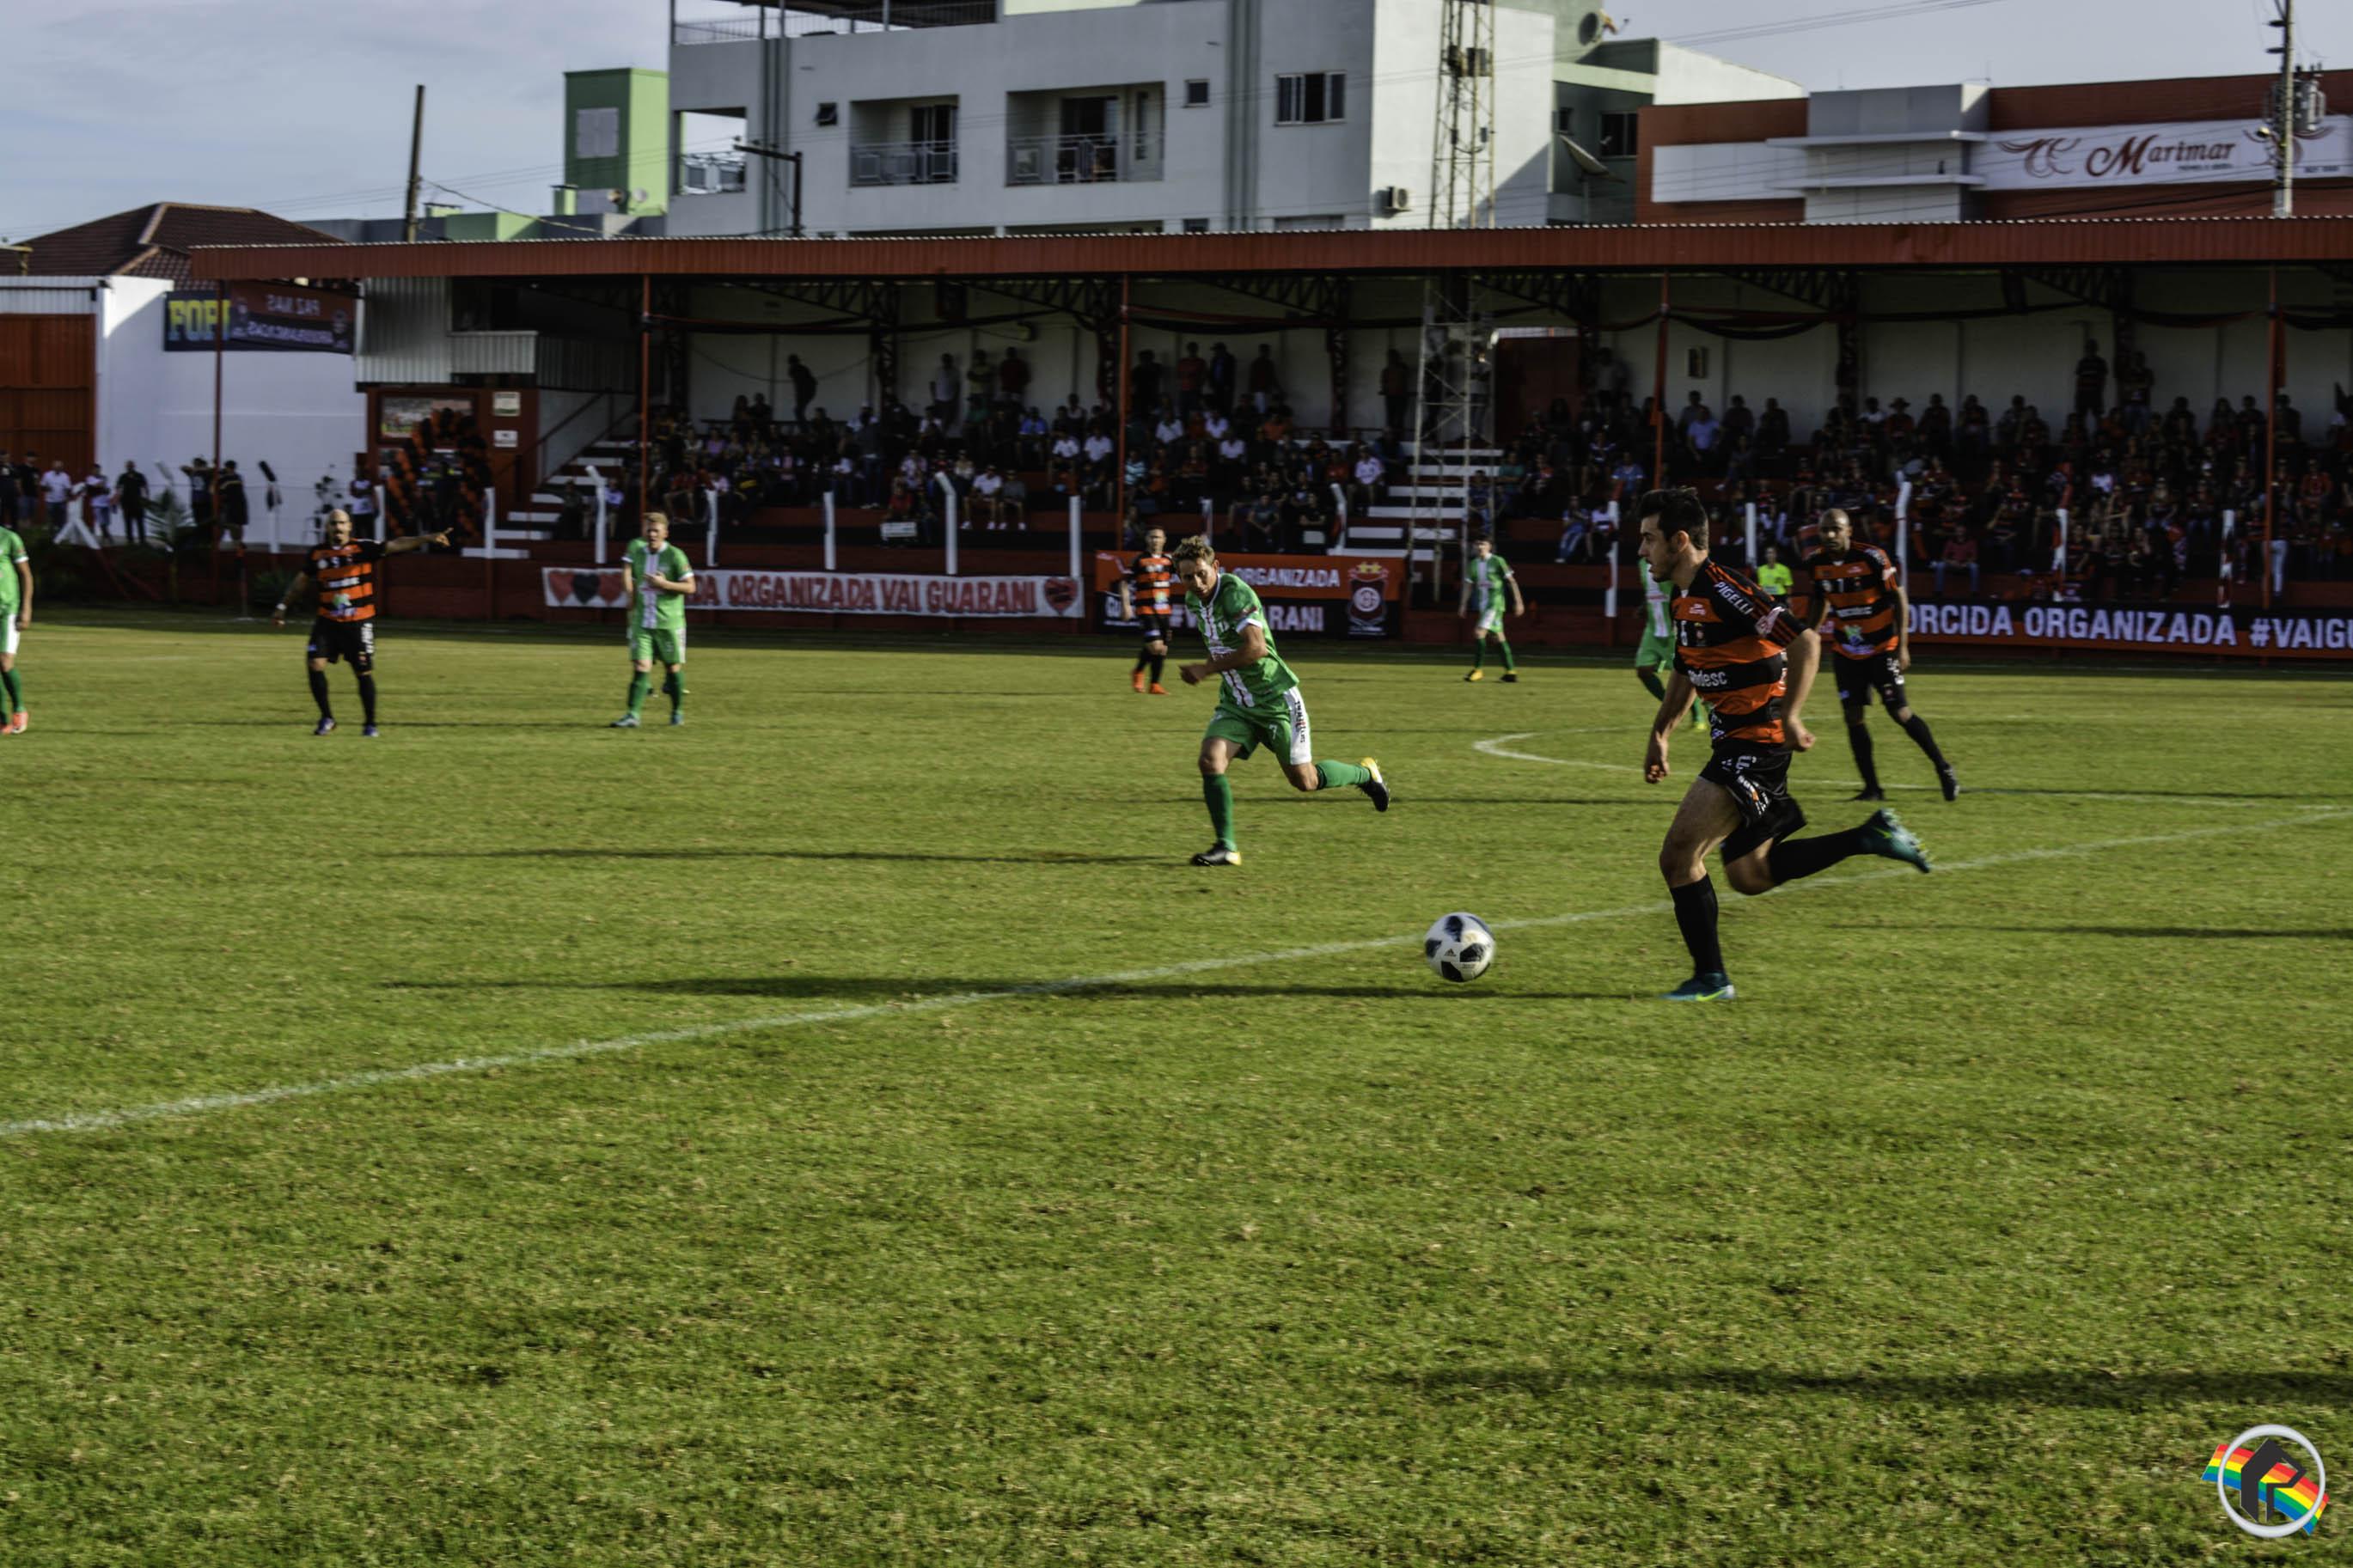 Grêmio Tunense e Guarani se enfrentam valendo liderança da Chave C